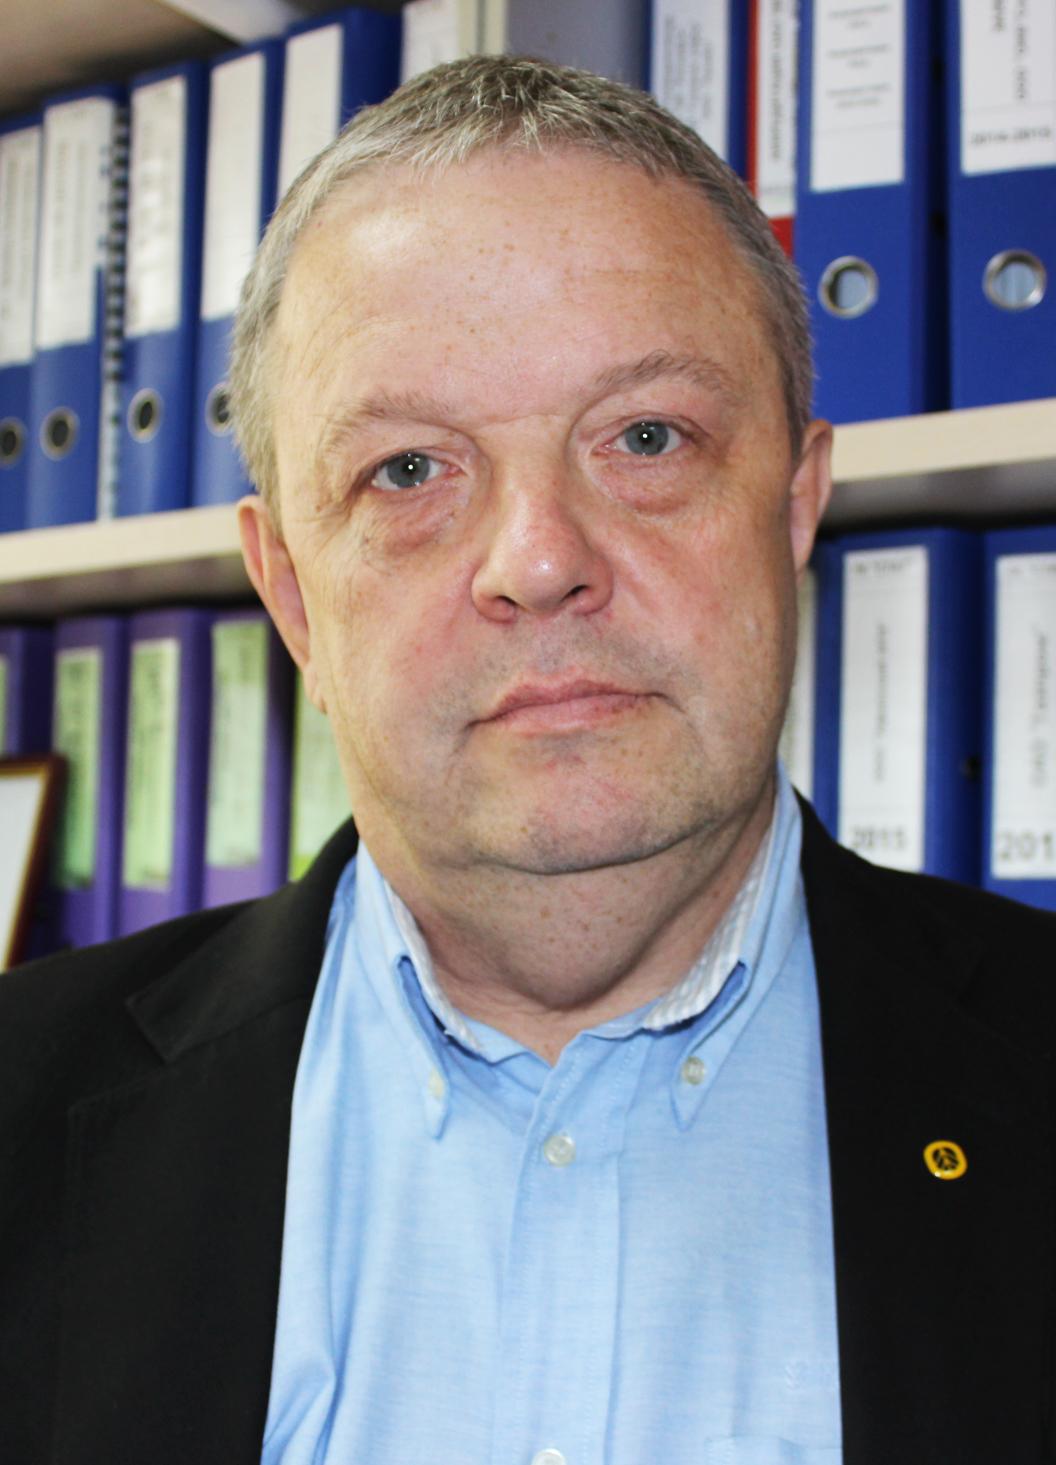 Andrey Olegovich Nikitin